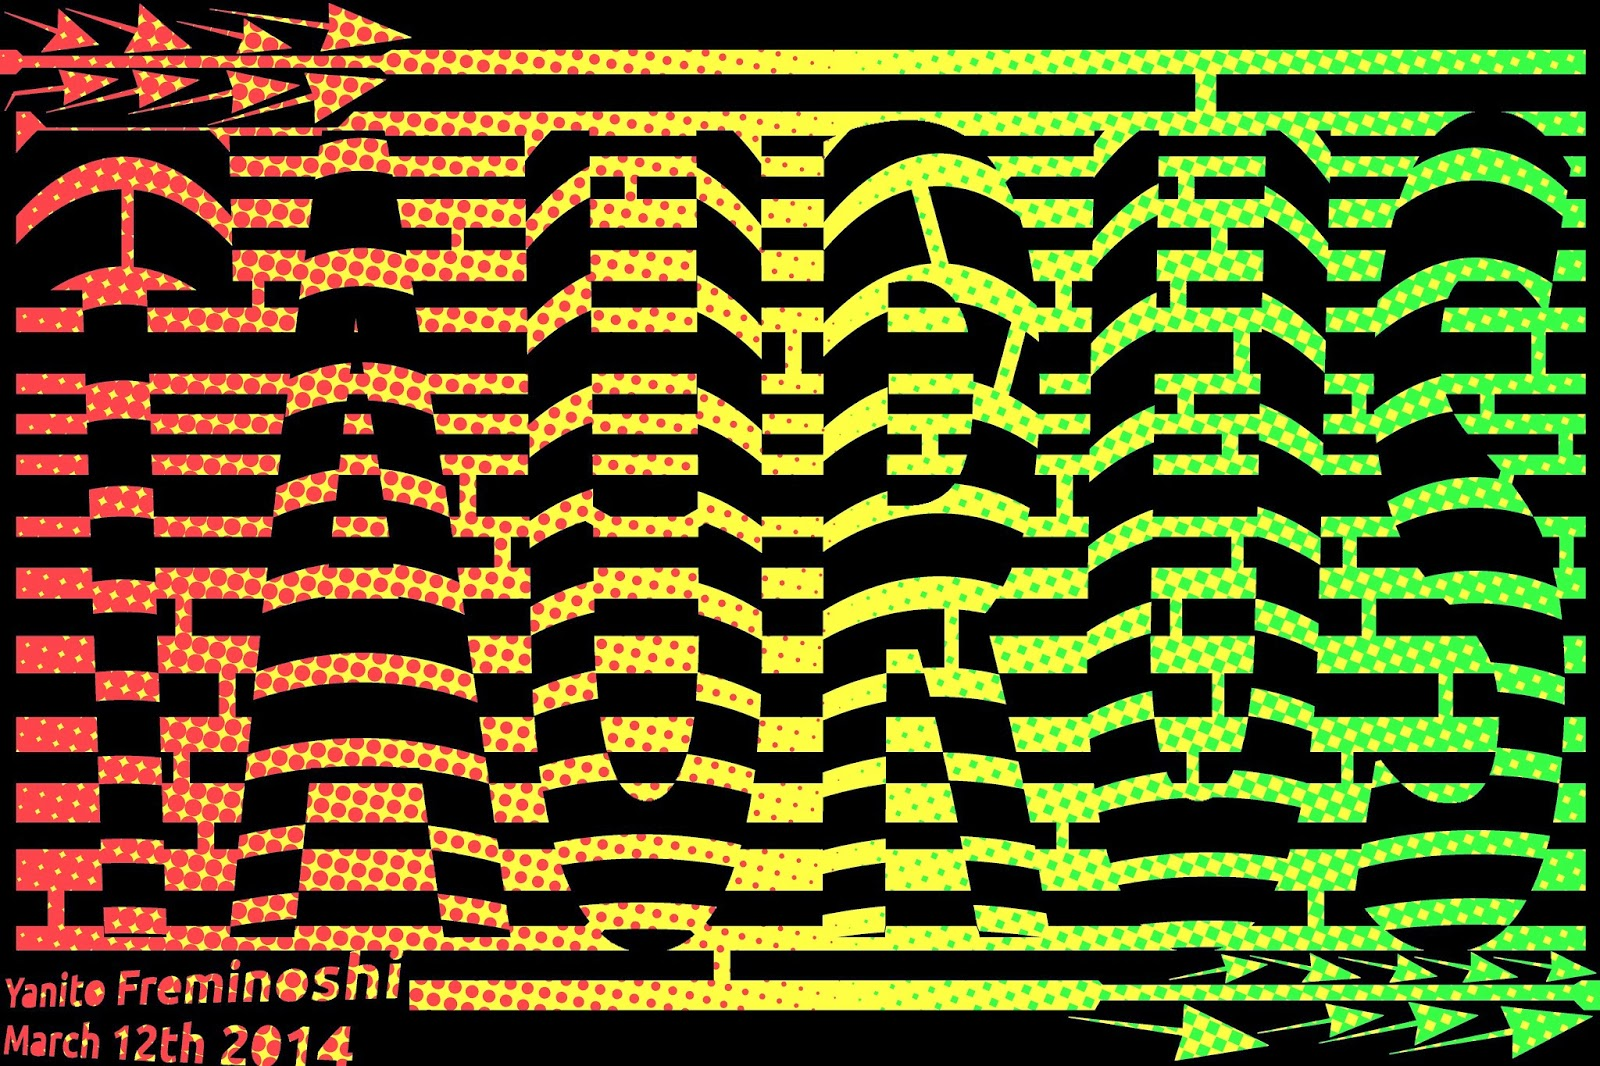 Taurus Maze in Op Art Font | Yanito Freminoshi